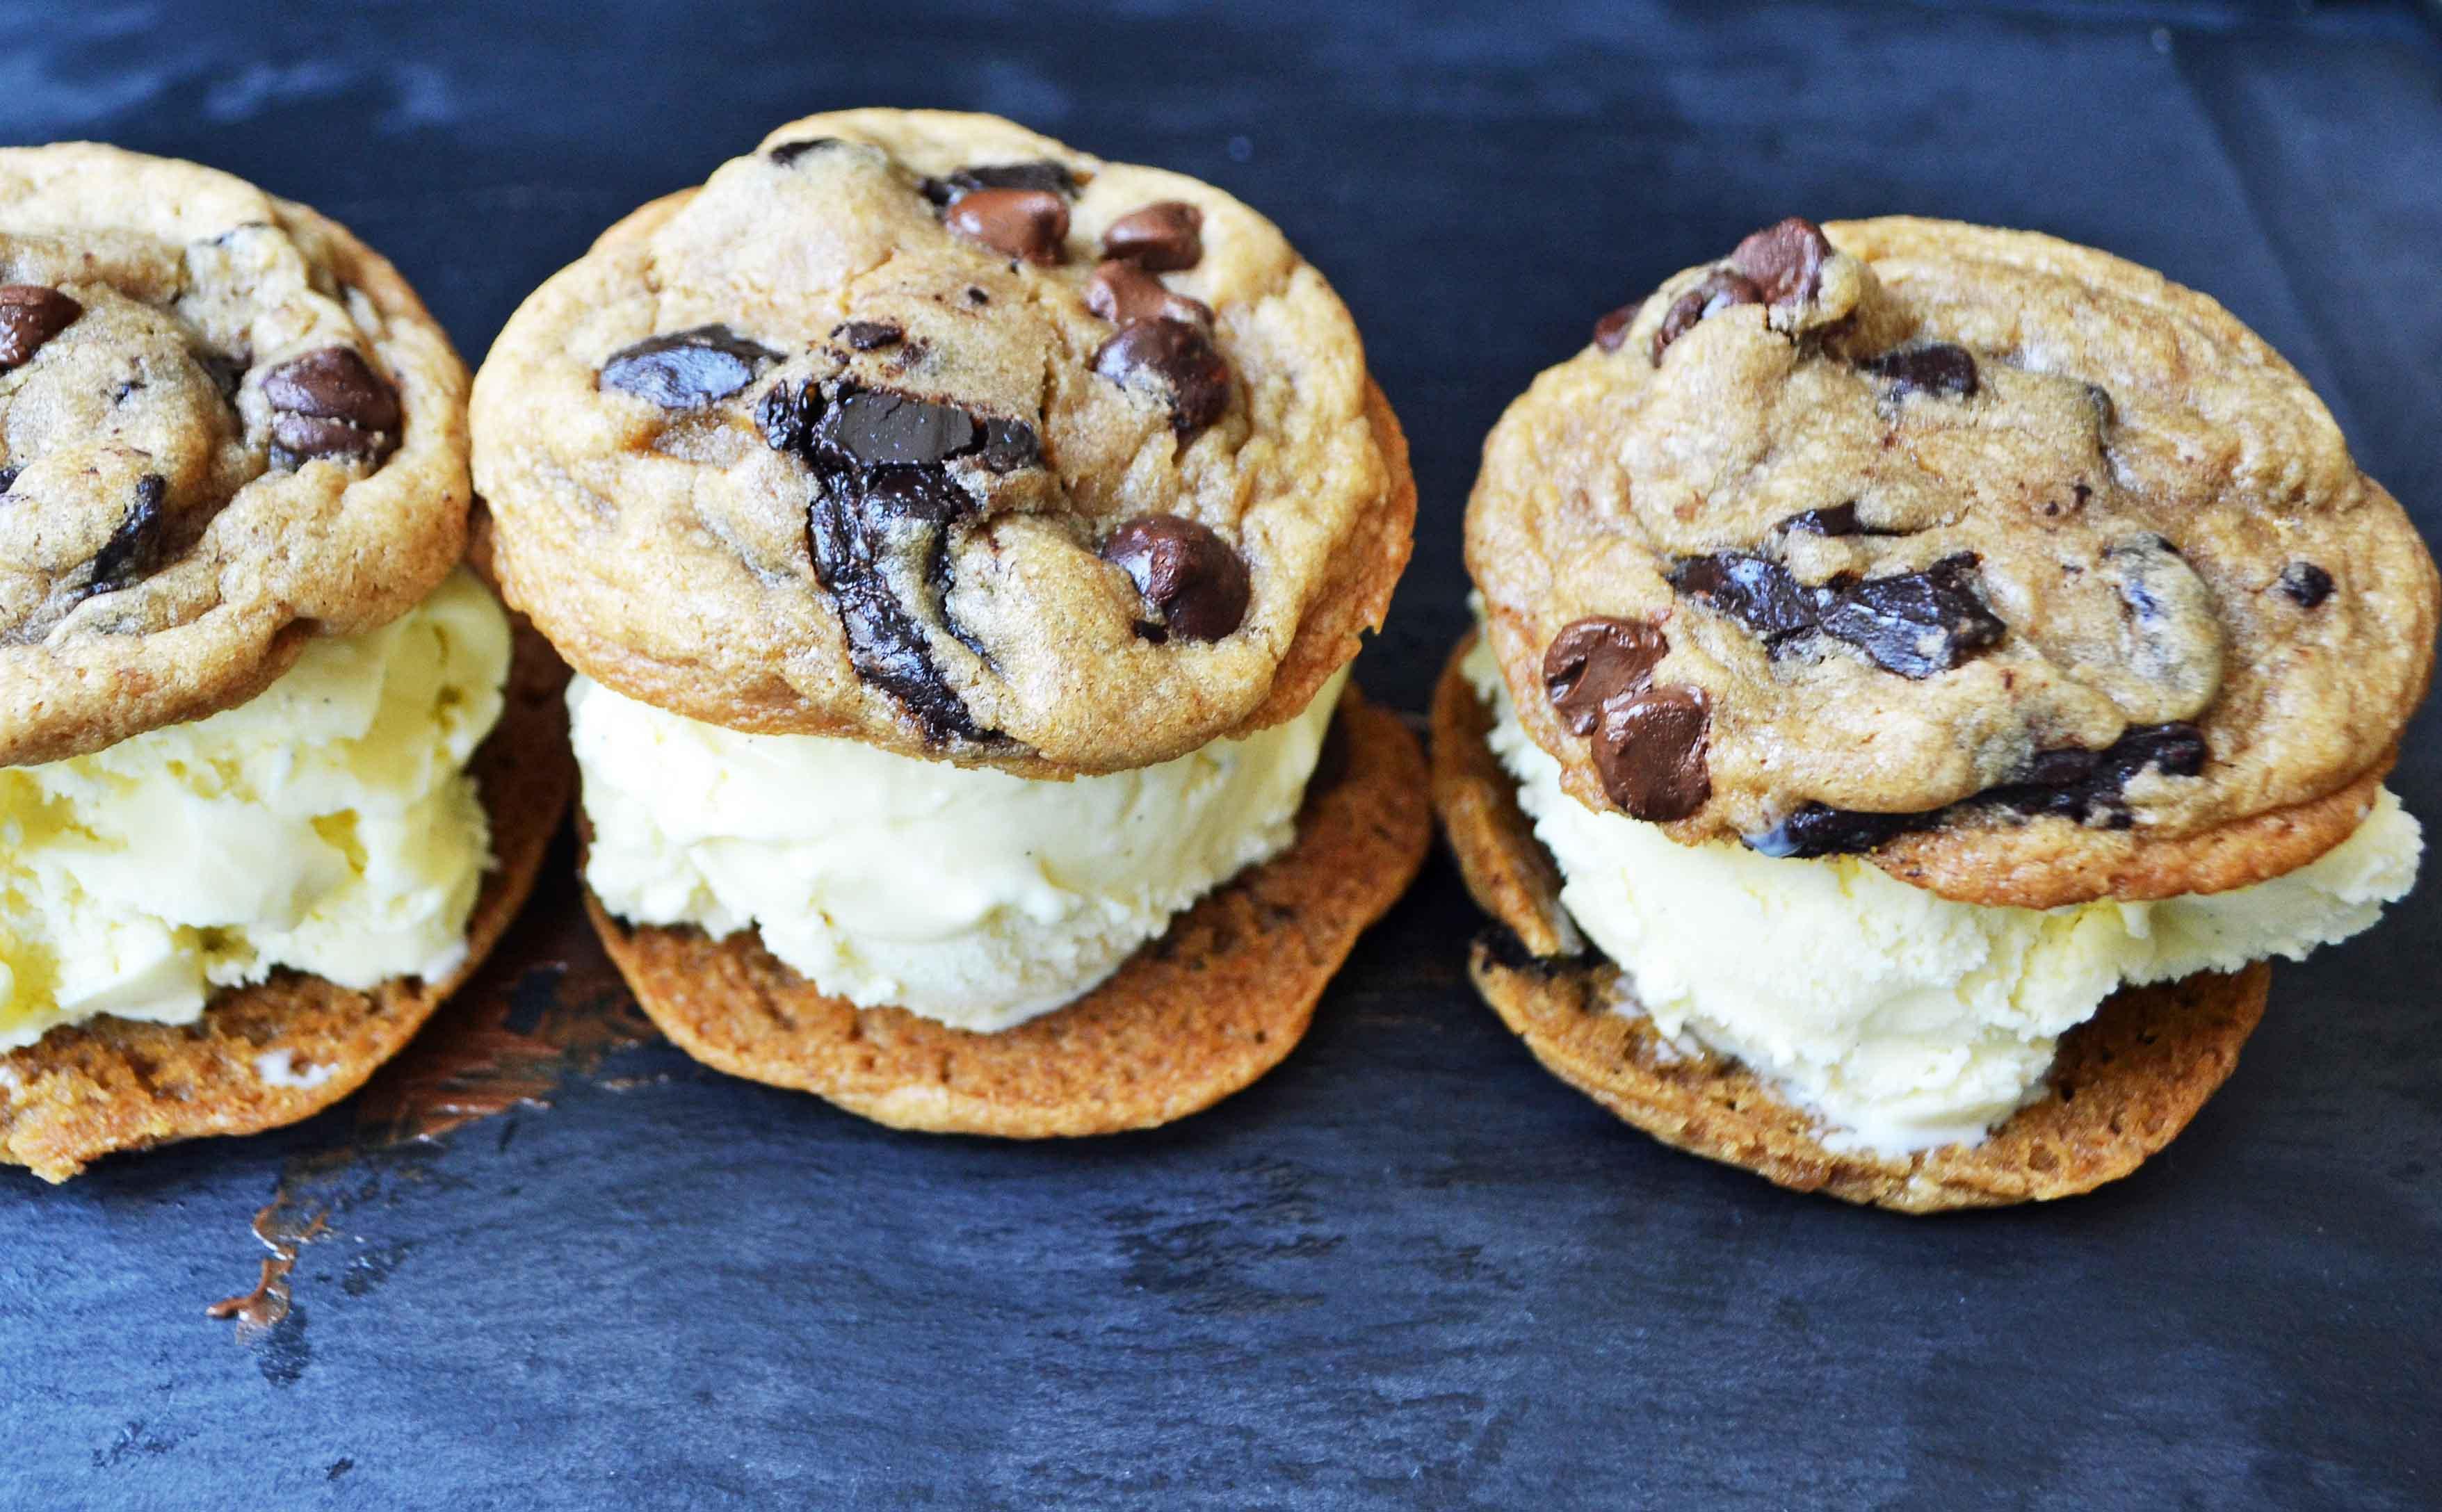 Chocolate Chip Cookie Ice Cream Sandwich. Ultimate soft chocolate chip cookies stuffed with homemade vanilla bean ice cream. The most popular ice cream sandwich. www.modernhoney.com